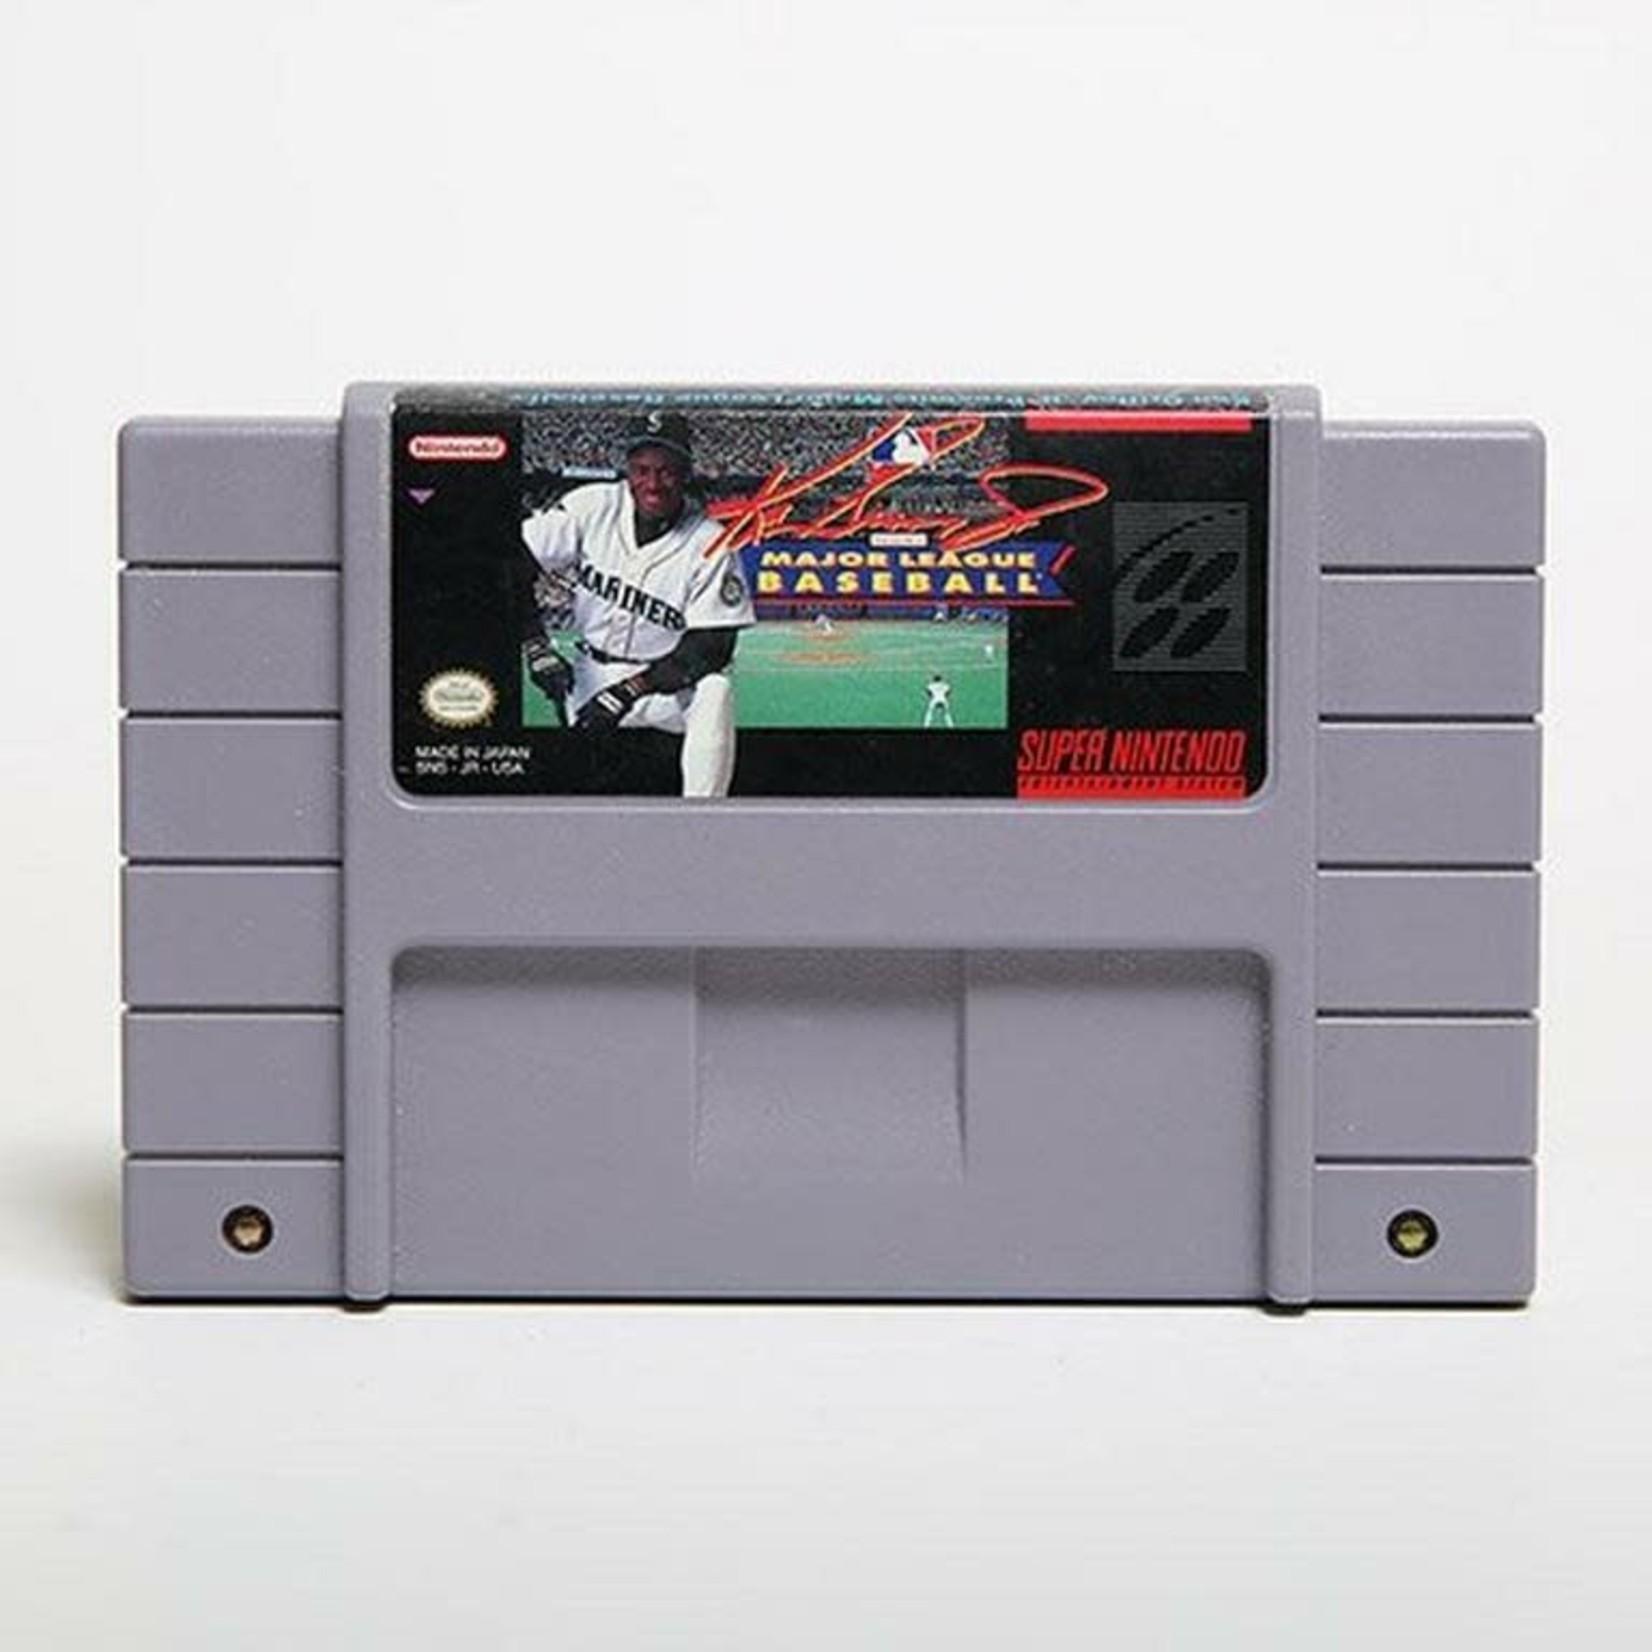 SNESU-Ken Griffey Jr Major League Baseball (Cartridge Only)